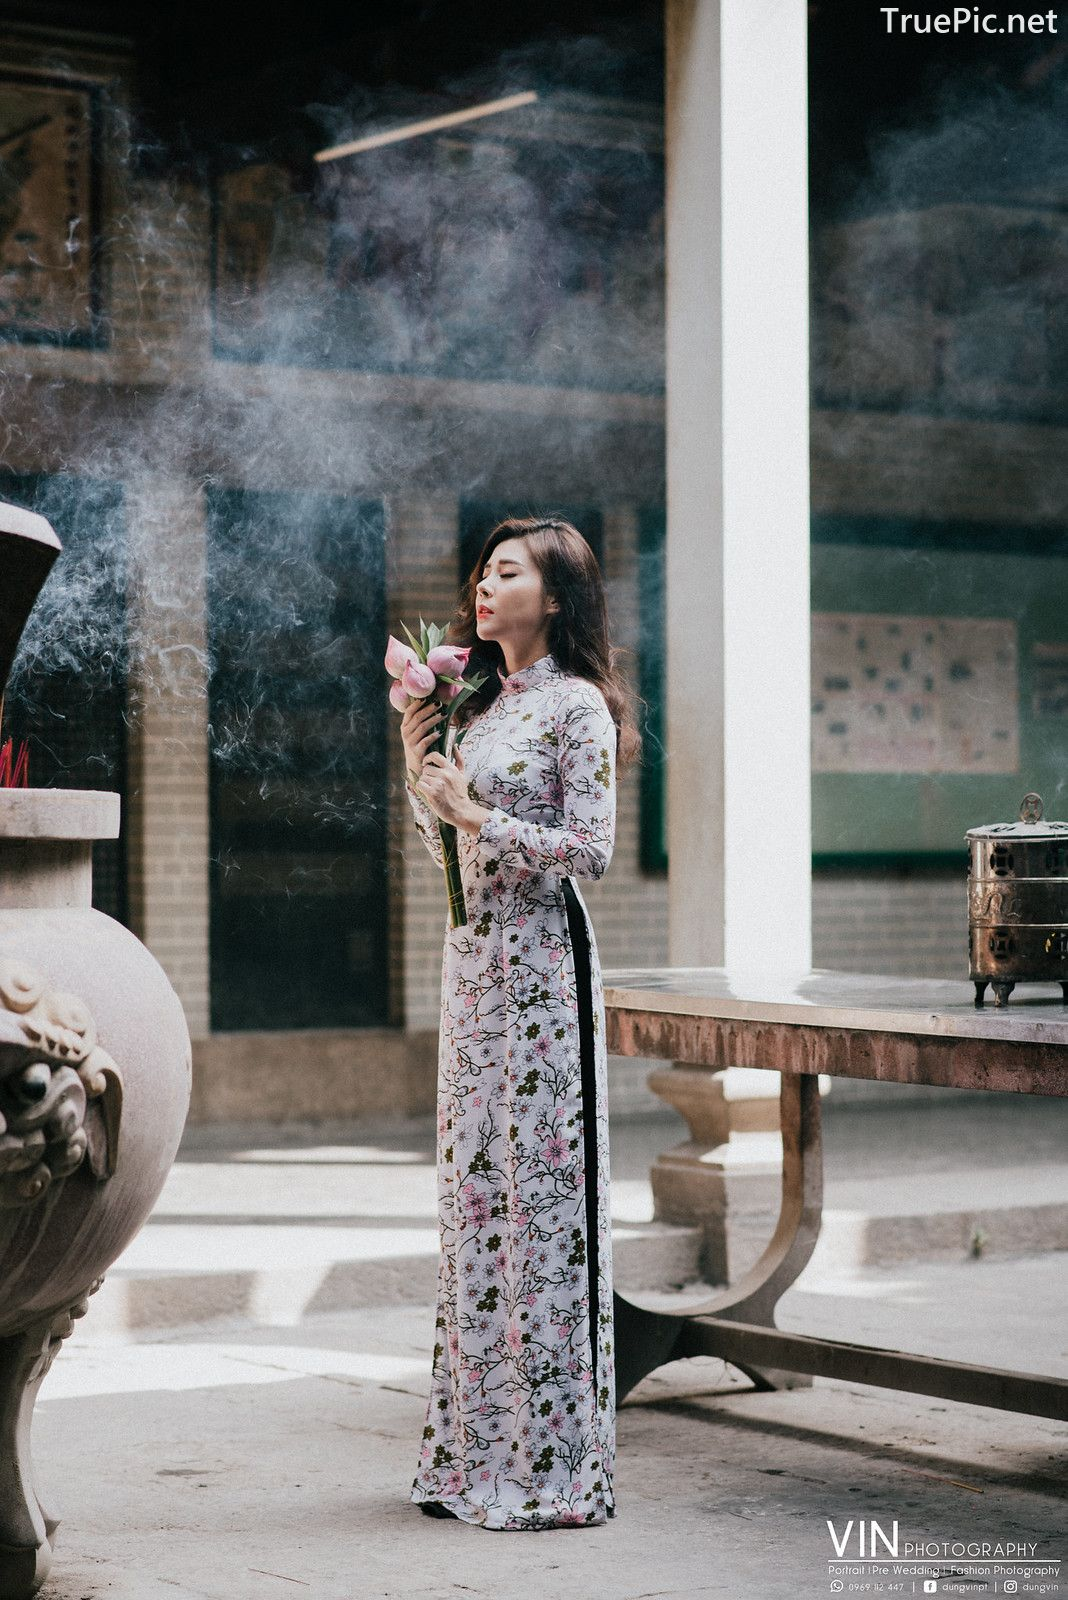 Image-Vietnamese-Beautiful-Girl-Ao-Dai-Vietnam-Traditional-Dress-by-VIN-Photo-3-TruePic.net- Picture-10